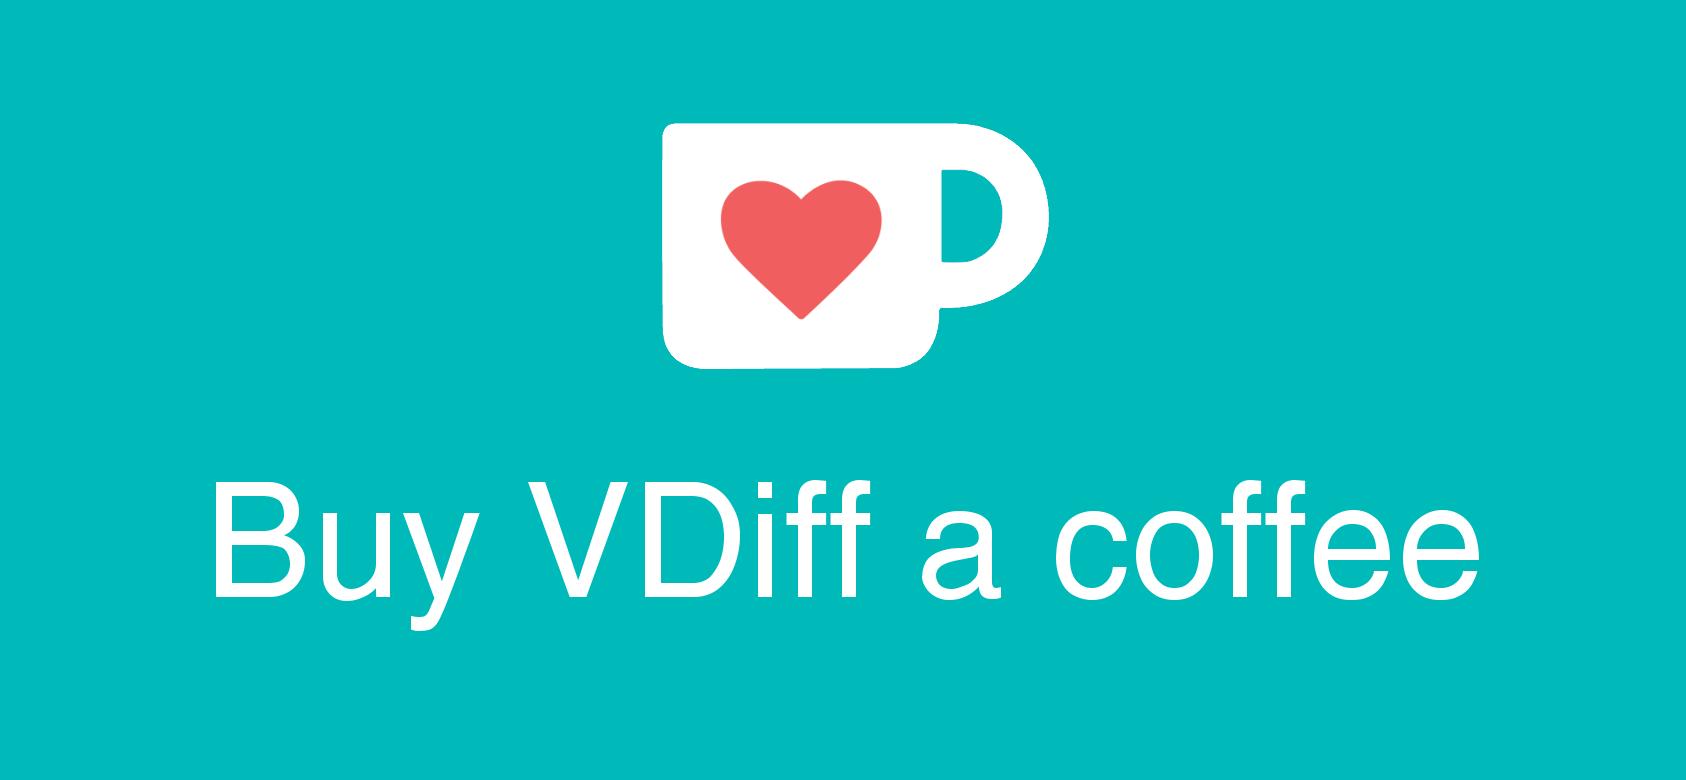 Buy VDiff a coffee